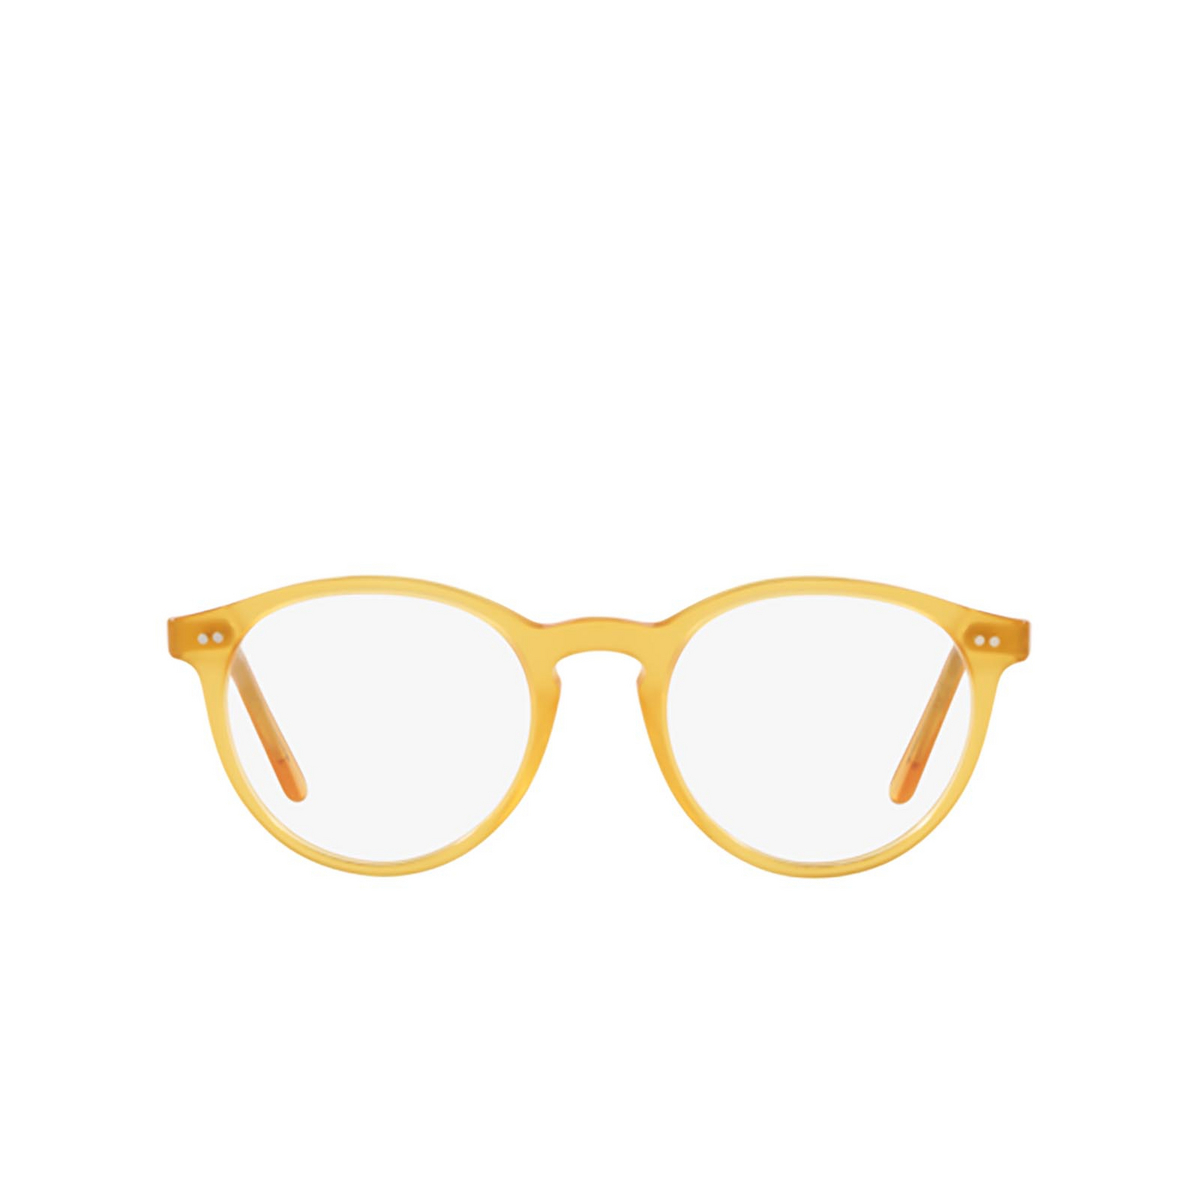 Polo Ralph Lauren® Round Eyeglasses: PH2083 color Shiny Honey 5184 - front view.